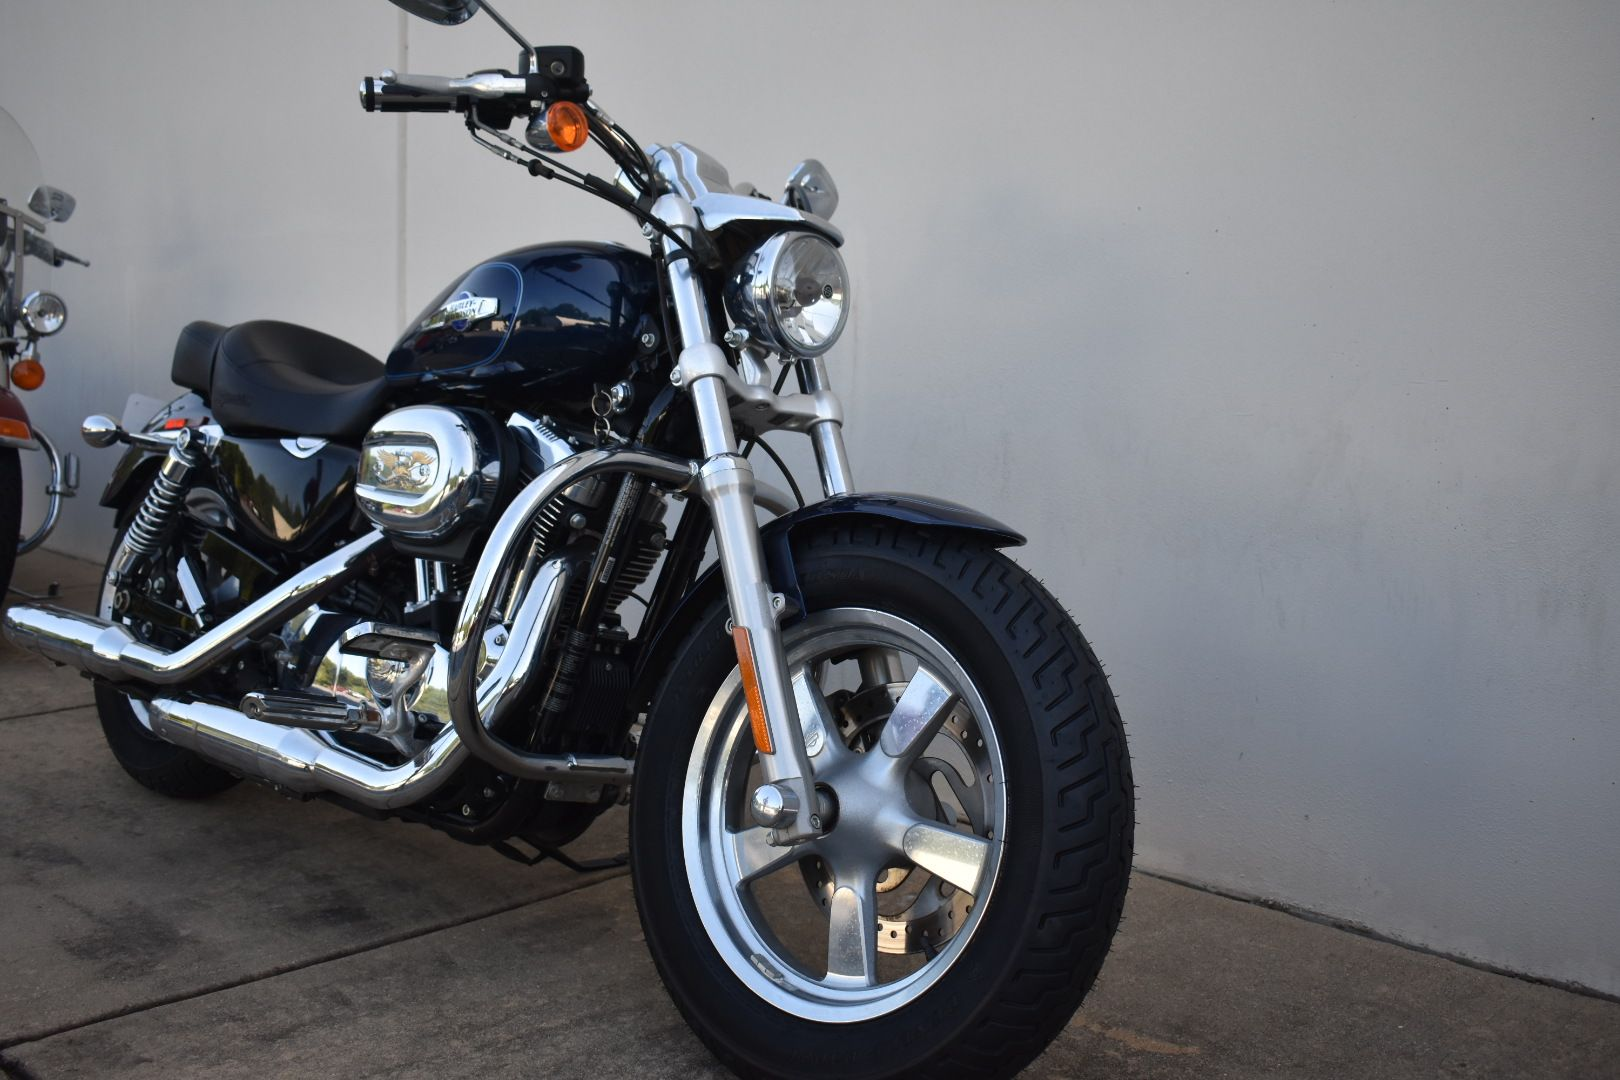 Pre-Owned 2014 Harley-Davidson 1200 Custom XL1200C